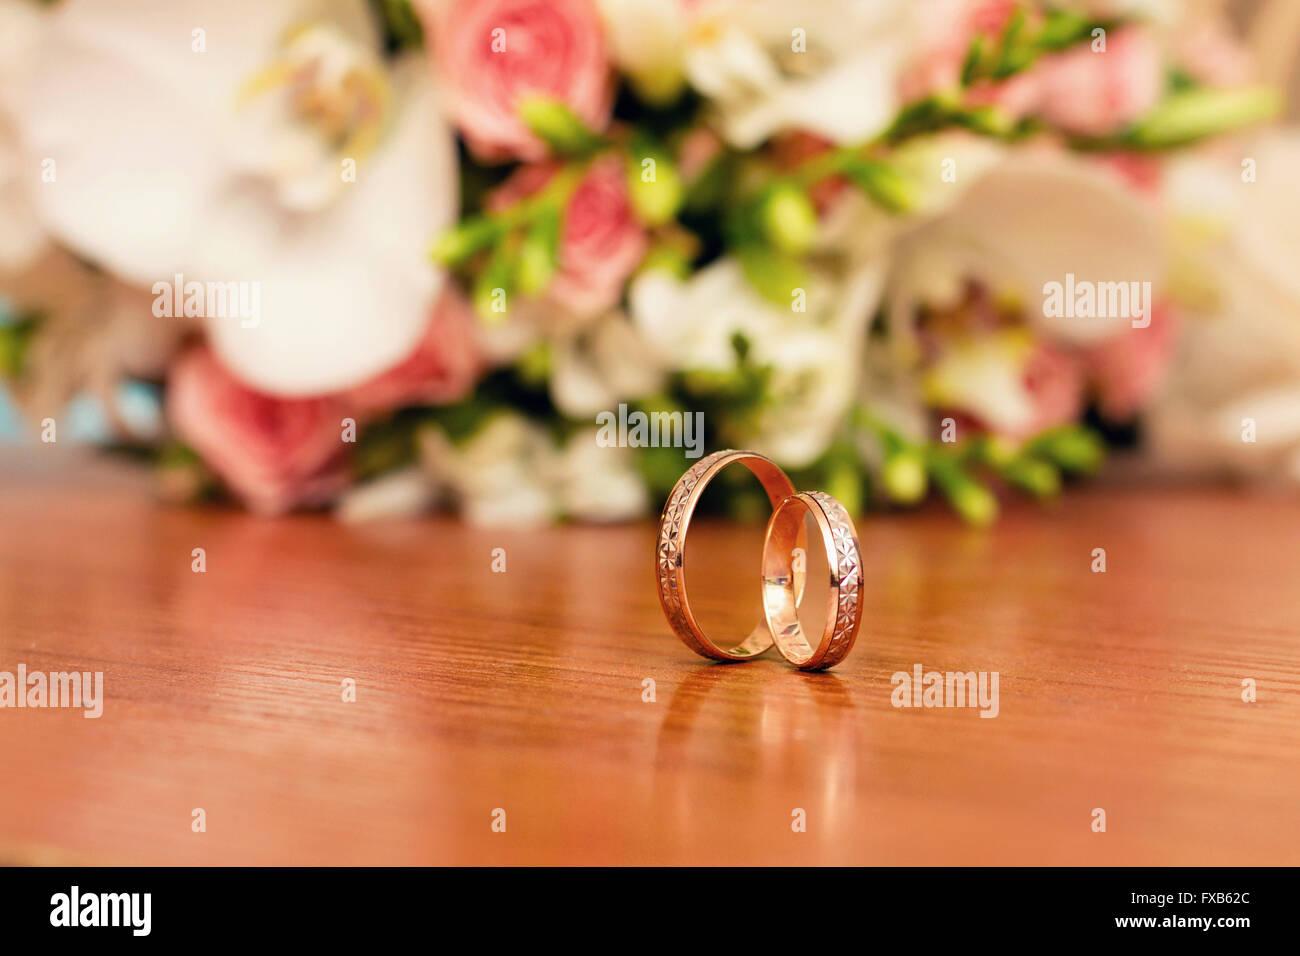 wedding ring against flower background - Stock Image